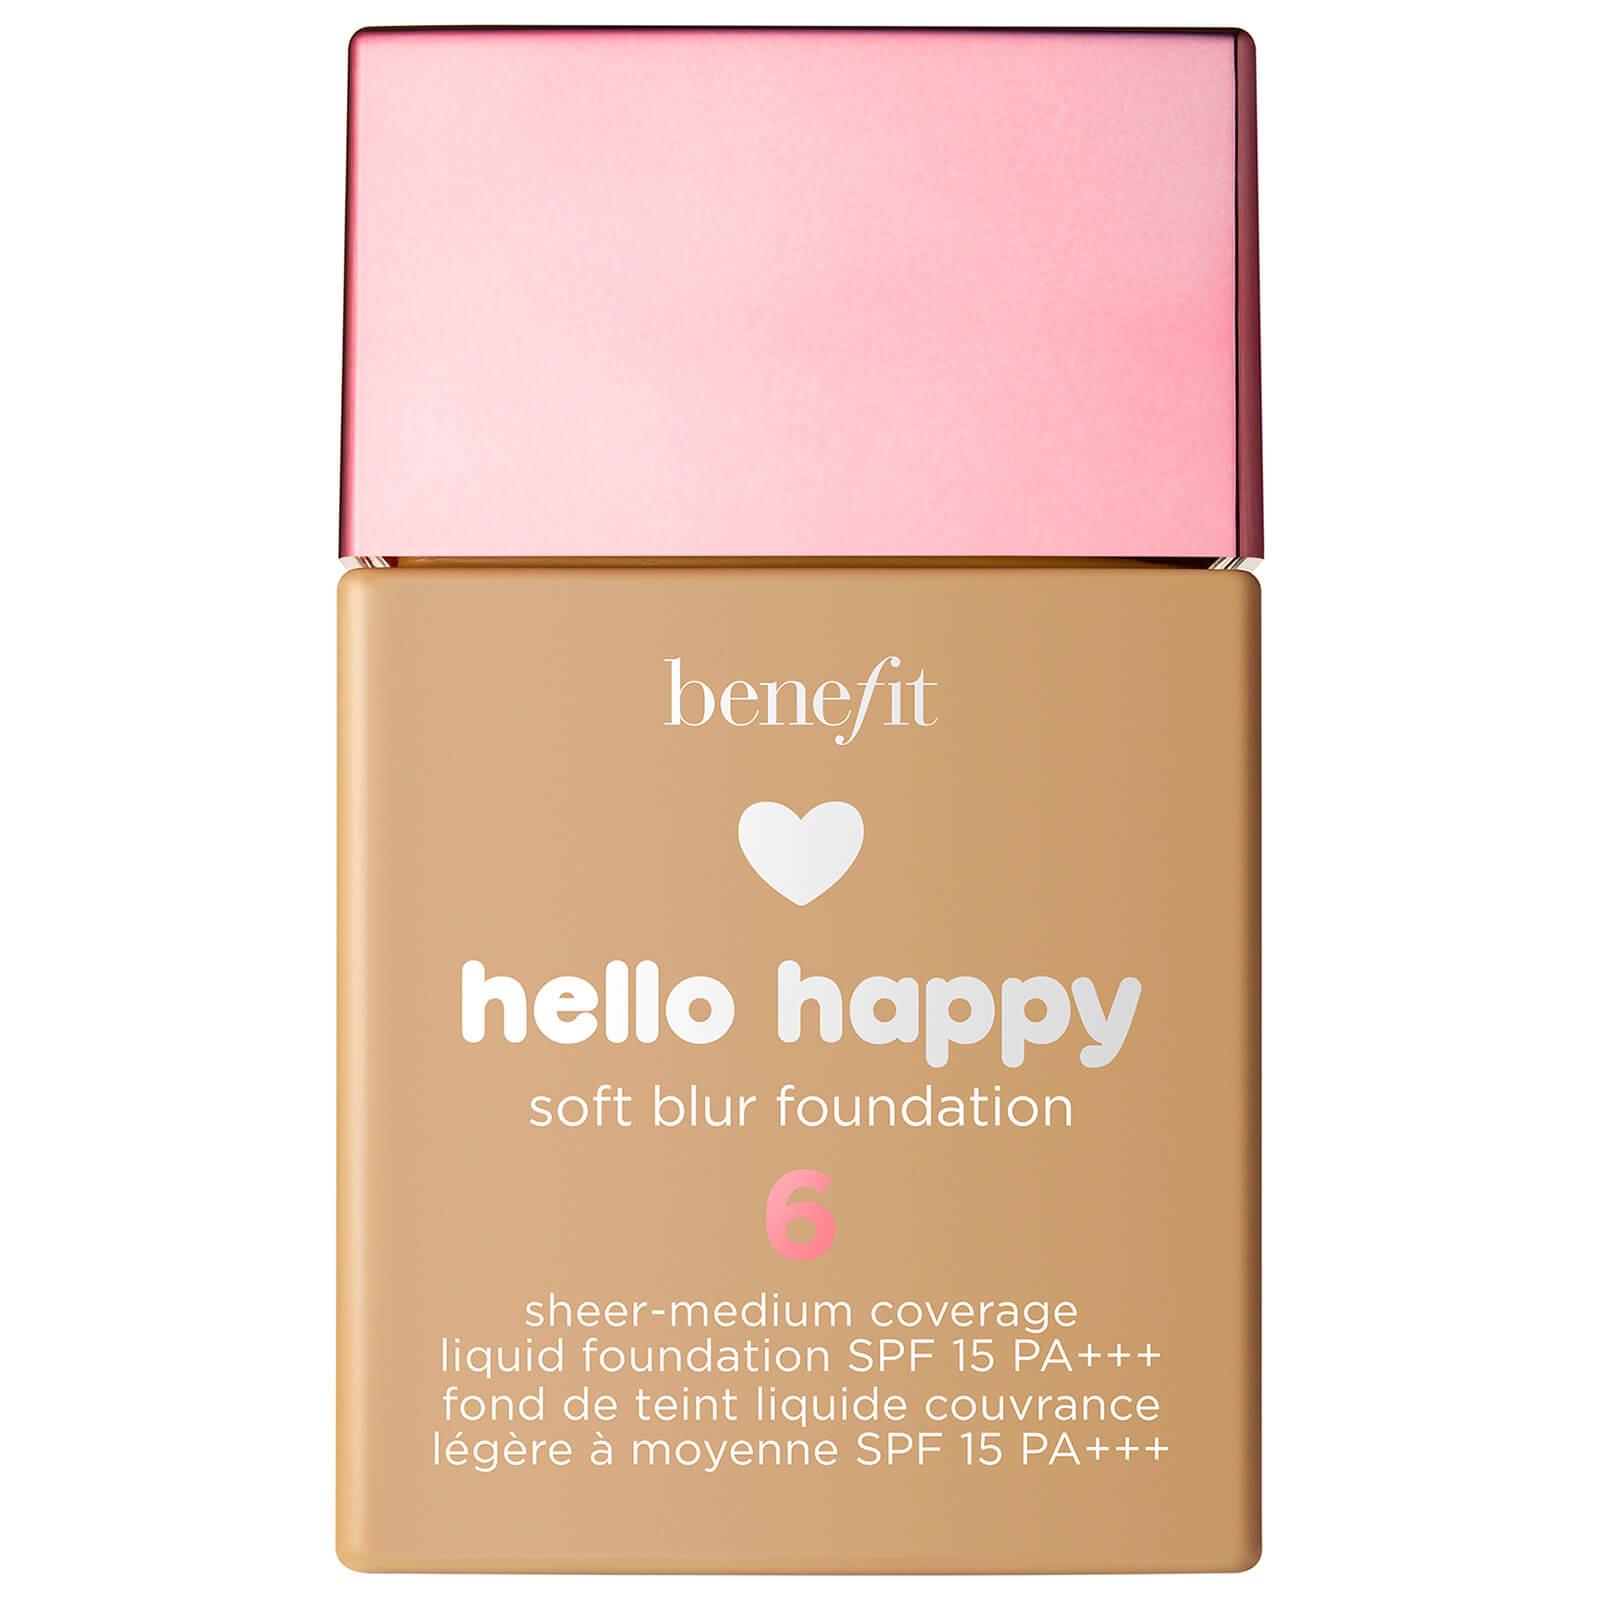 Benefit Hello Happy Soft Blur Foundation (Various Shades) - 6